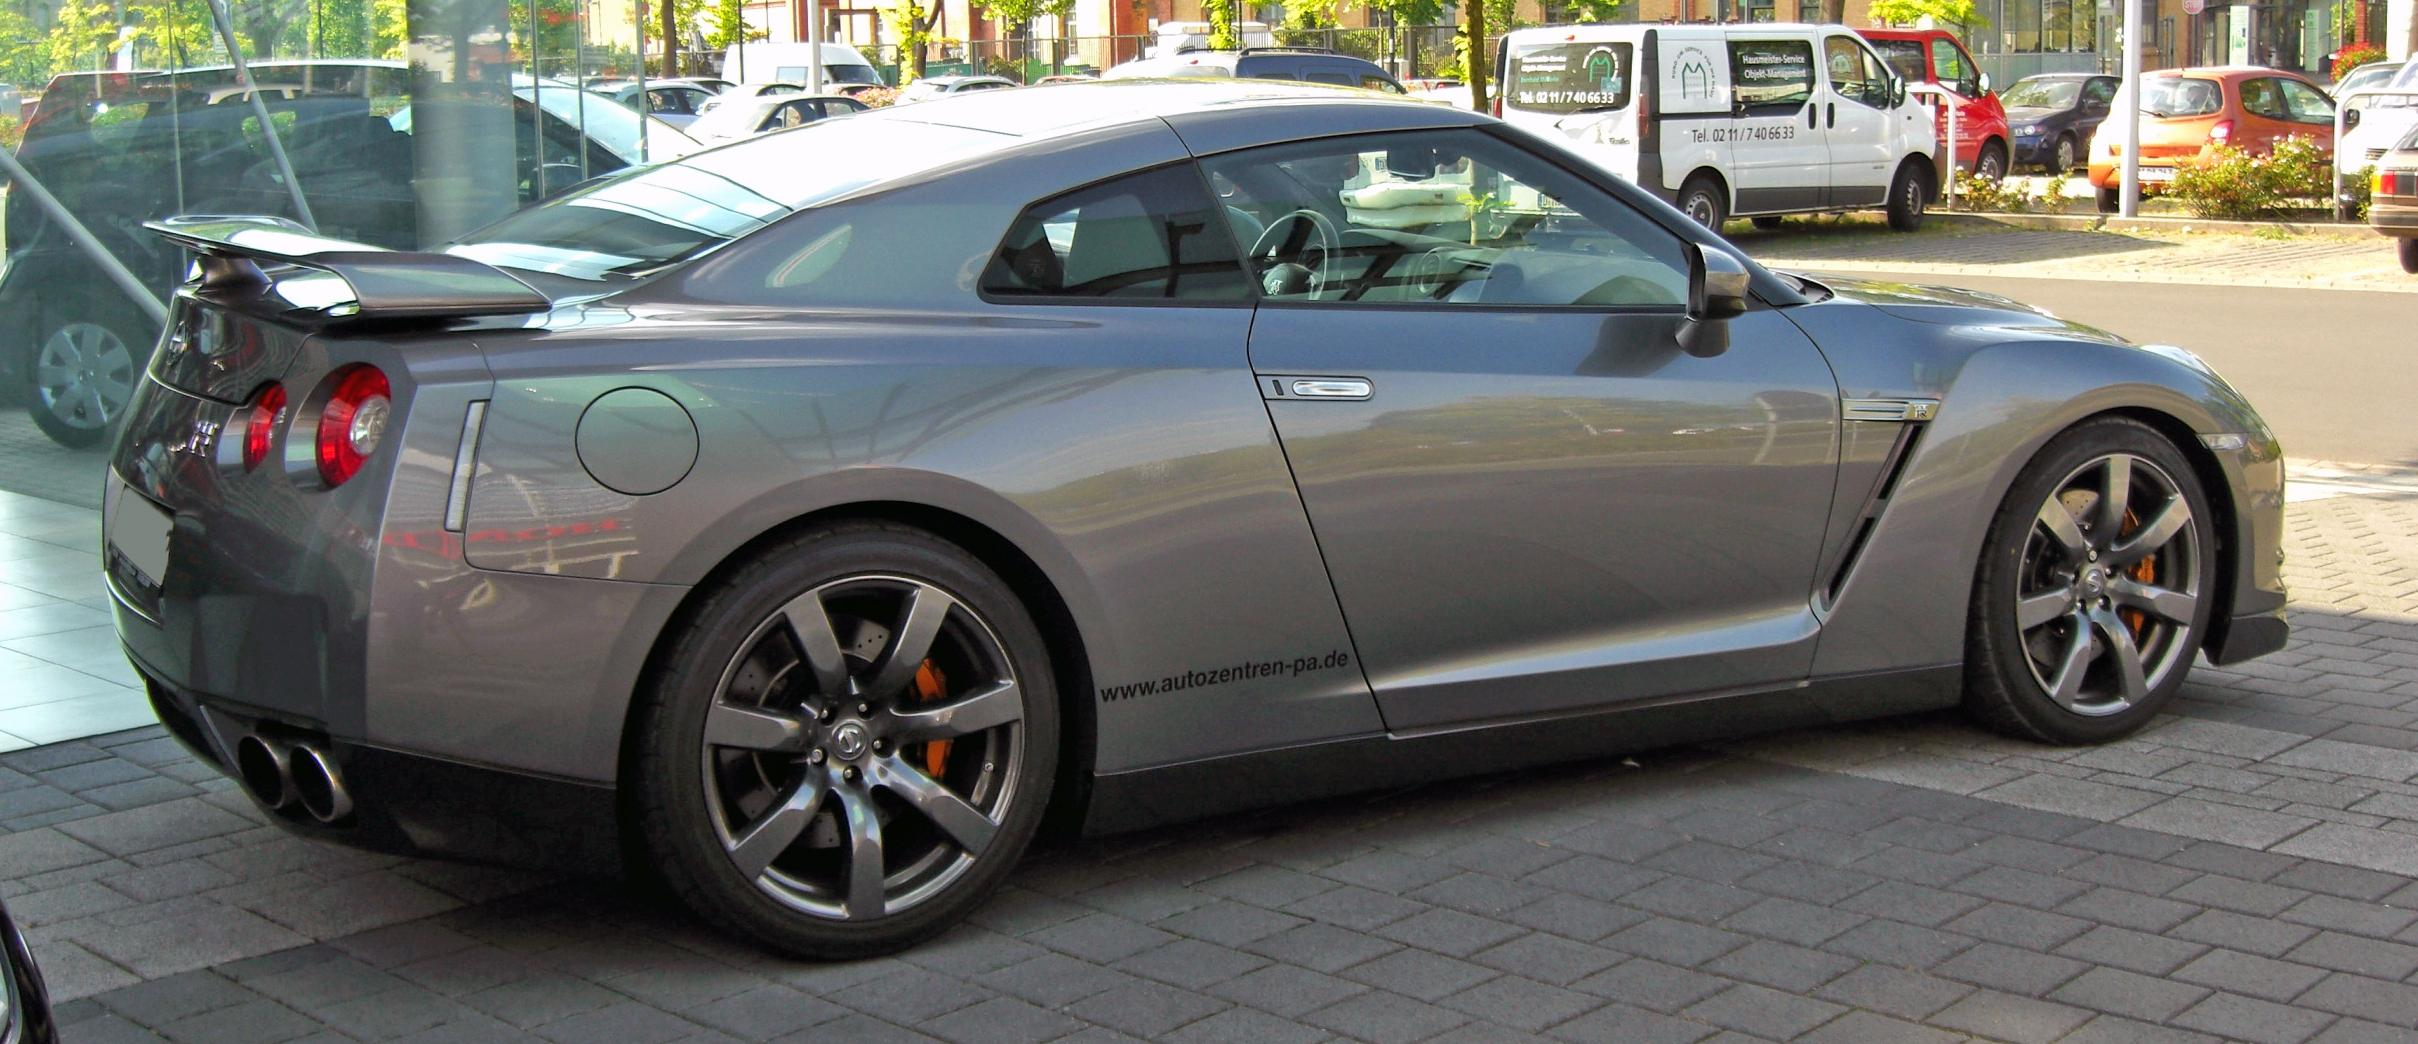 File:No.35 Nissan GT-R NISMO GT3 at 2015 Bathurst 12 Hour